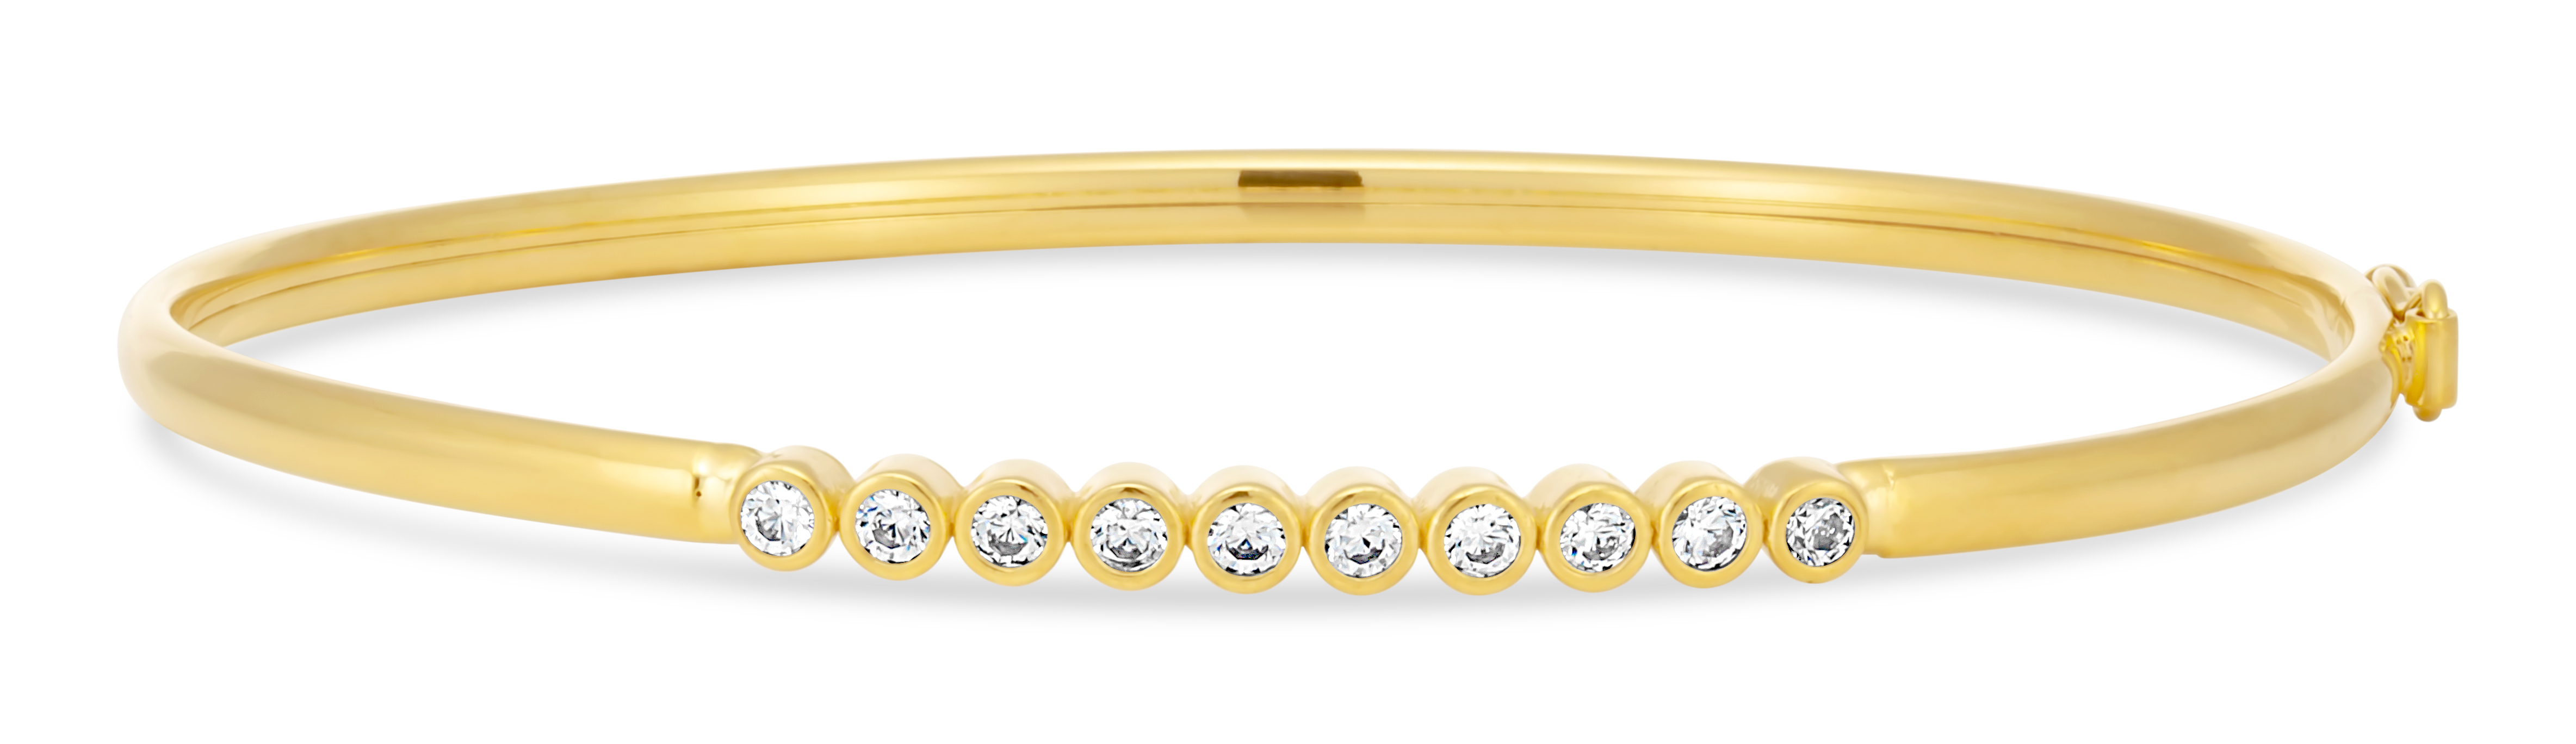 9ct Gold Filled Cubic Zirconia Bezel Set Bangle